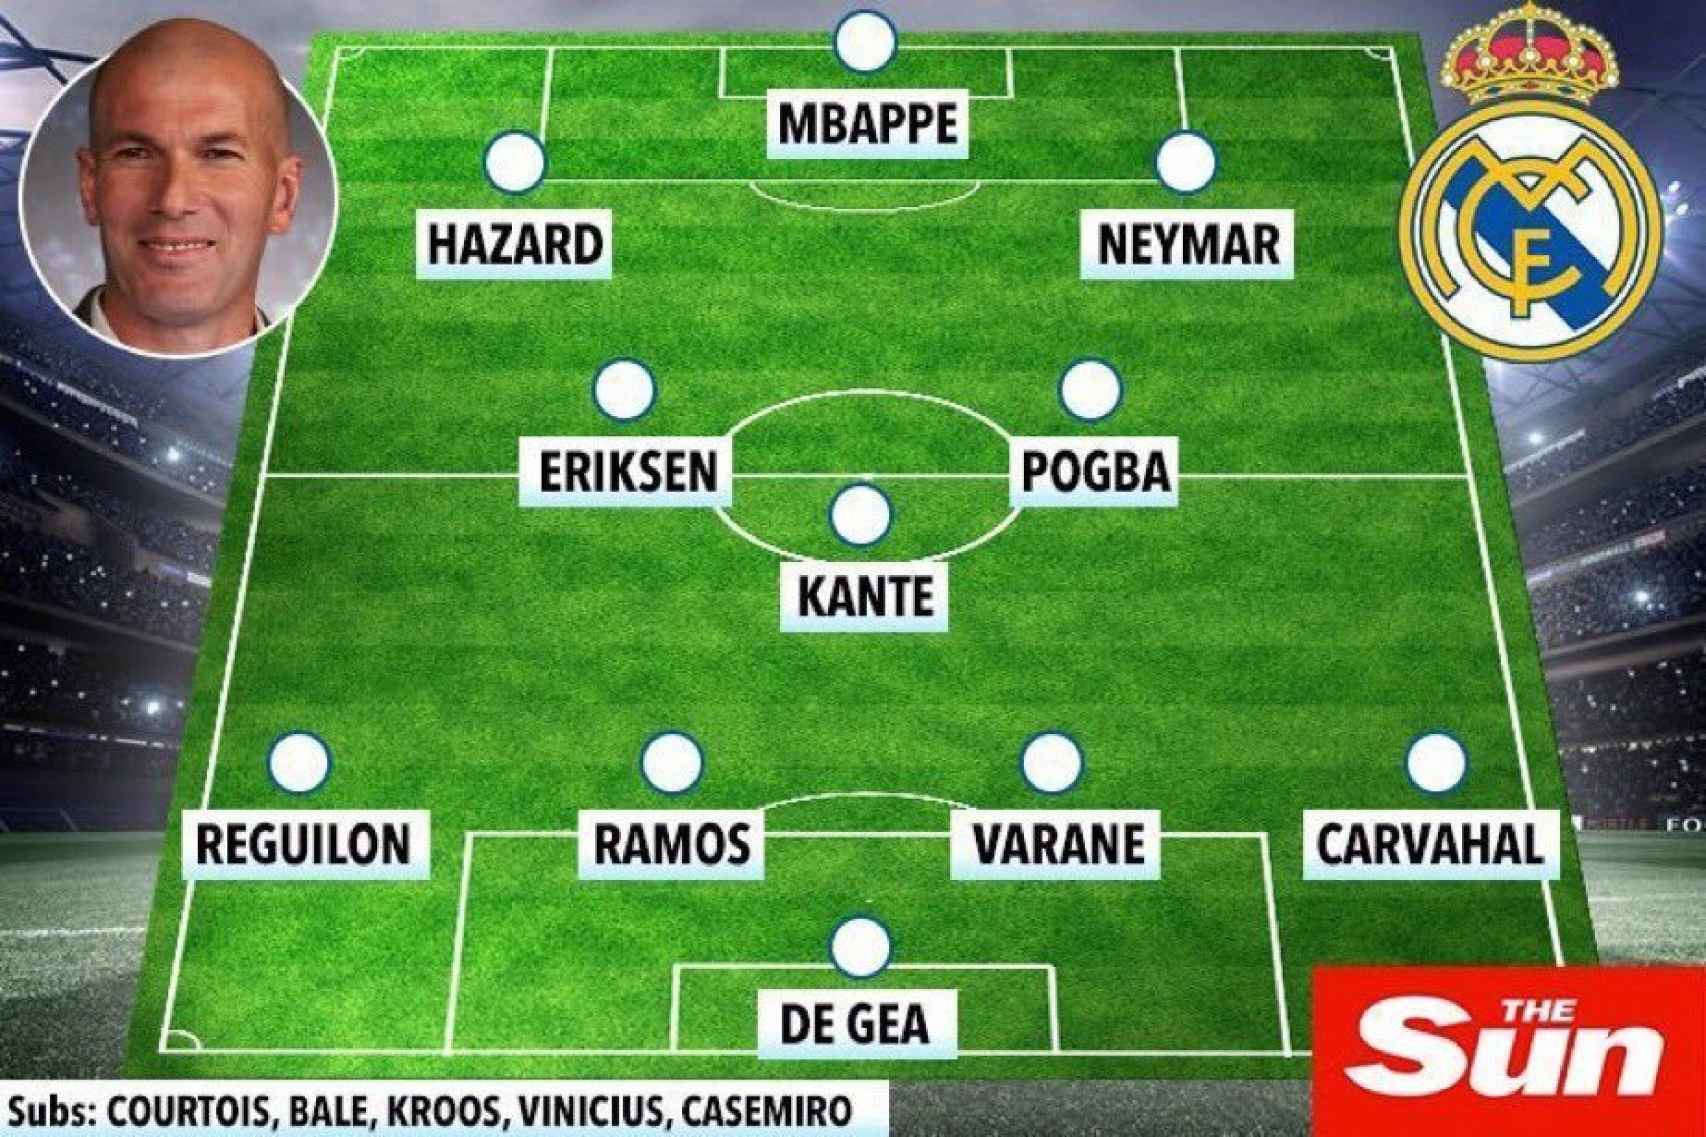 El superonce del Real Madrid de The Sun